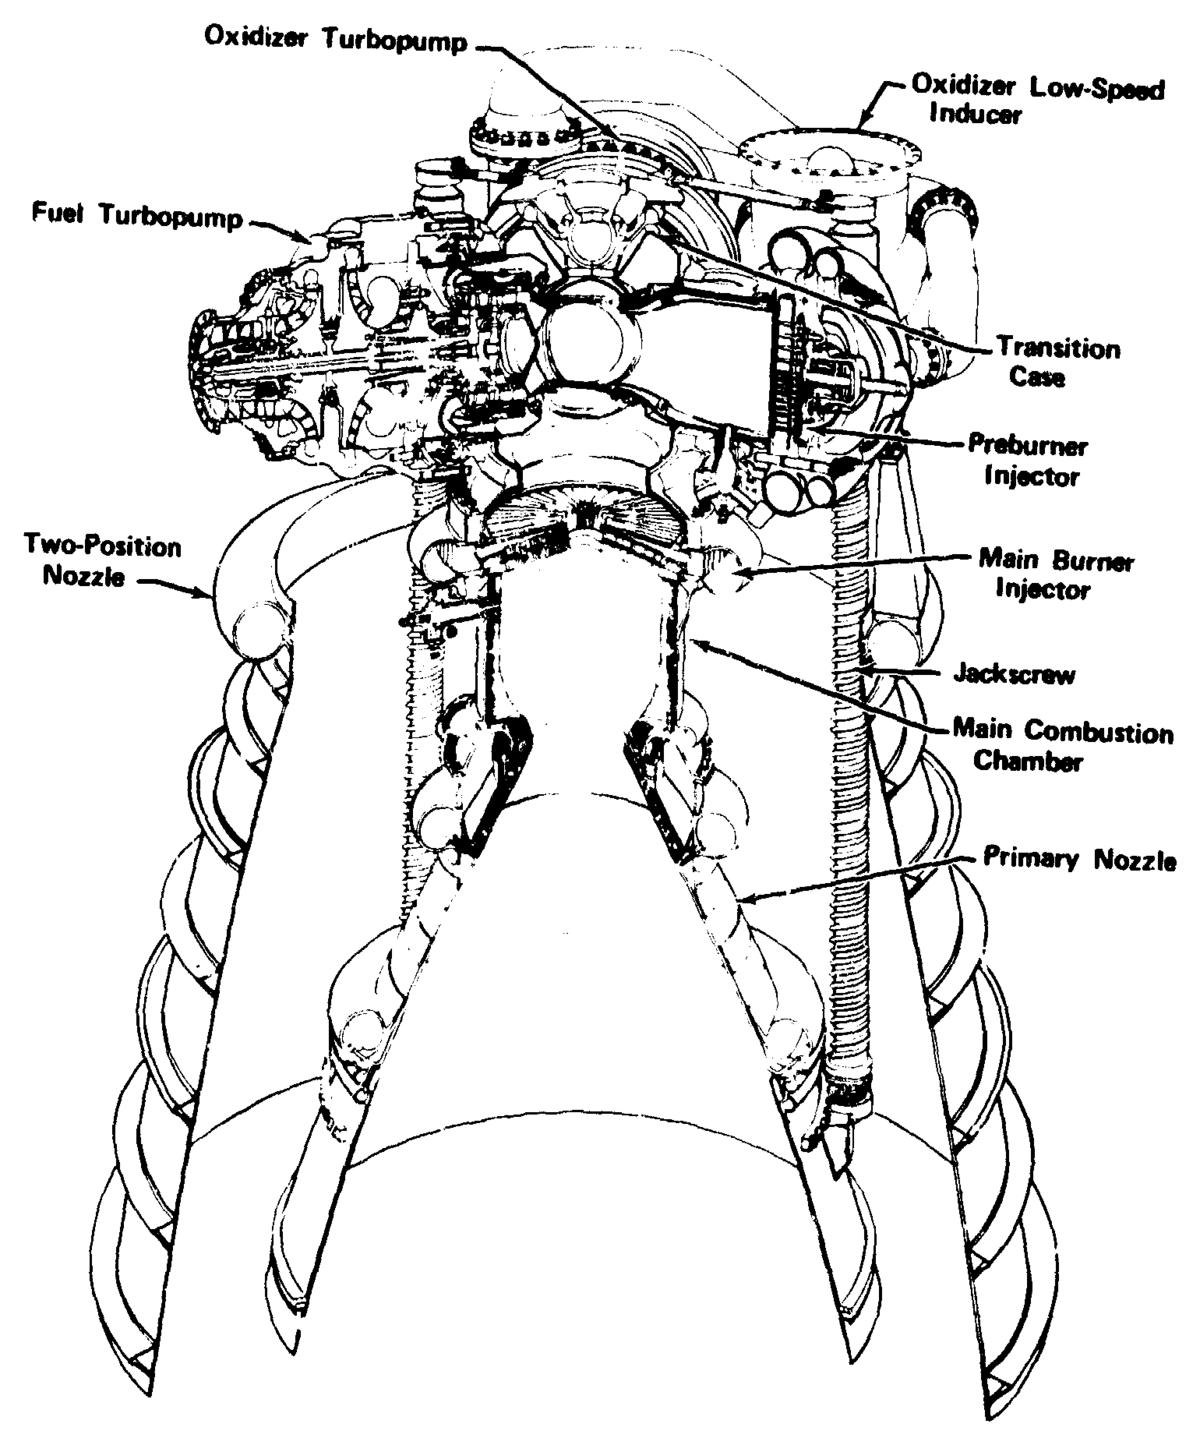 Expanding nozzle - Wikipedia